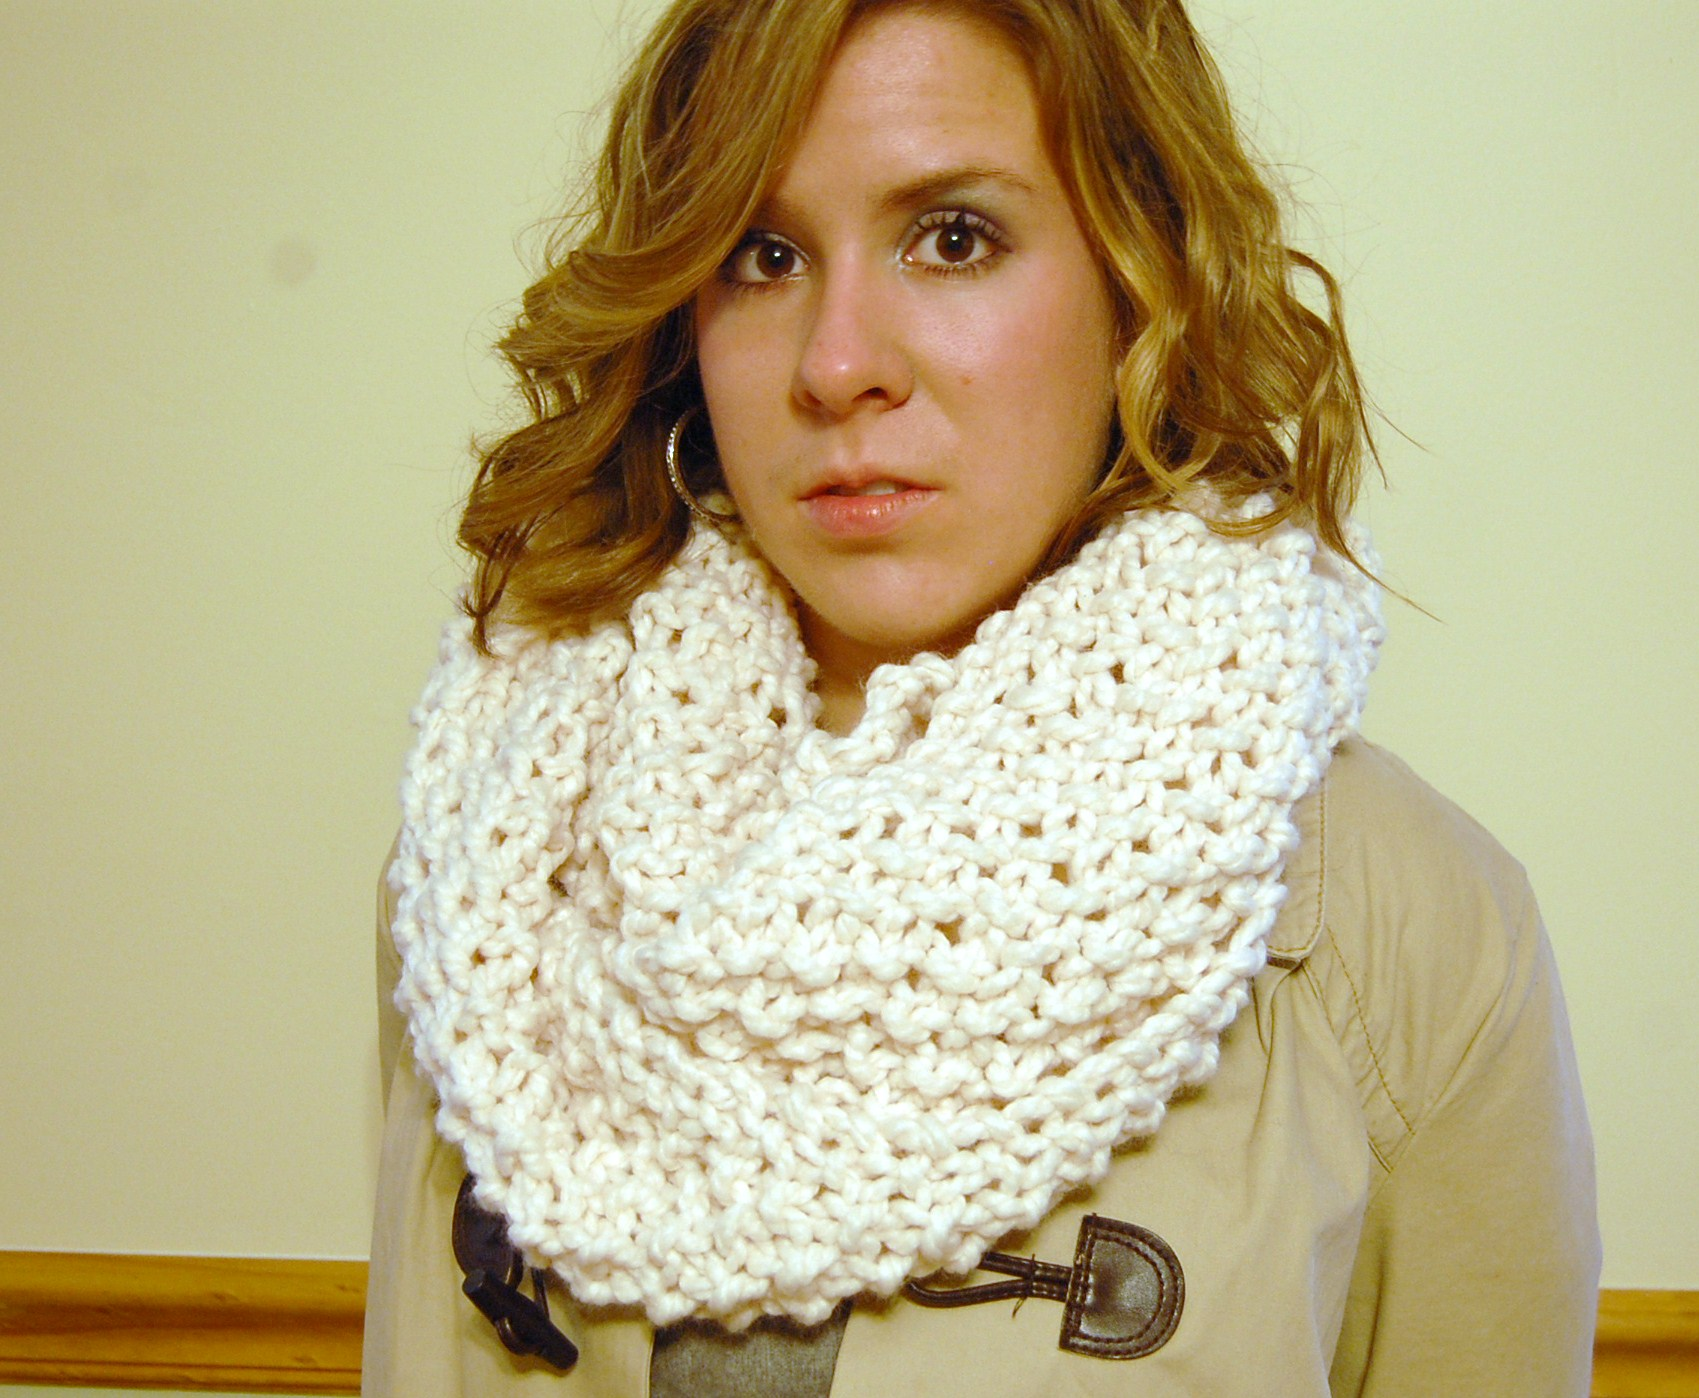 Knitting Patterns For Cowl Scarves - Erieairfair